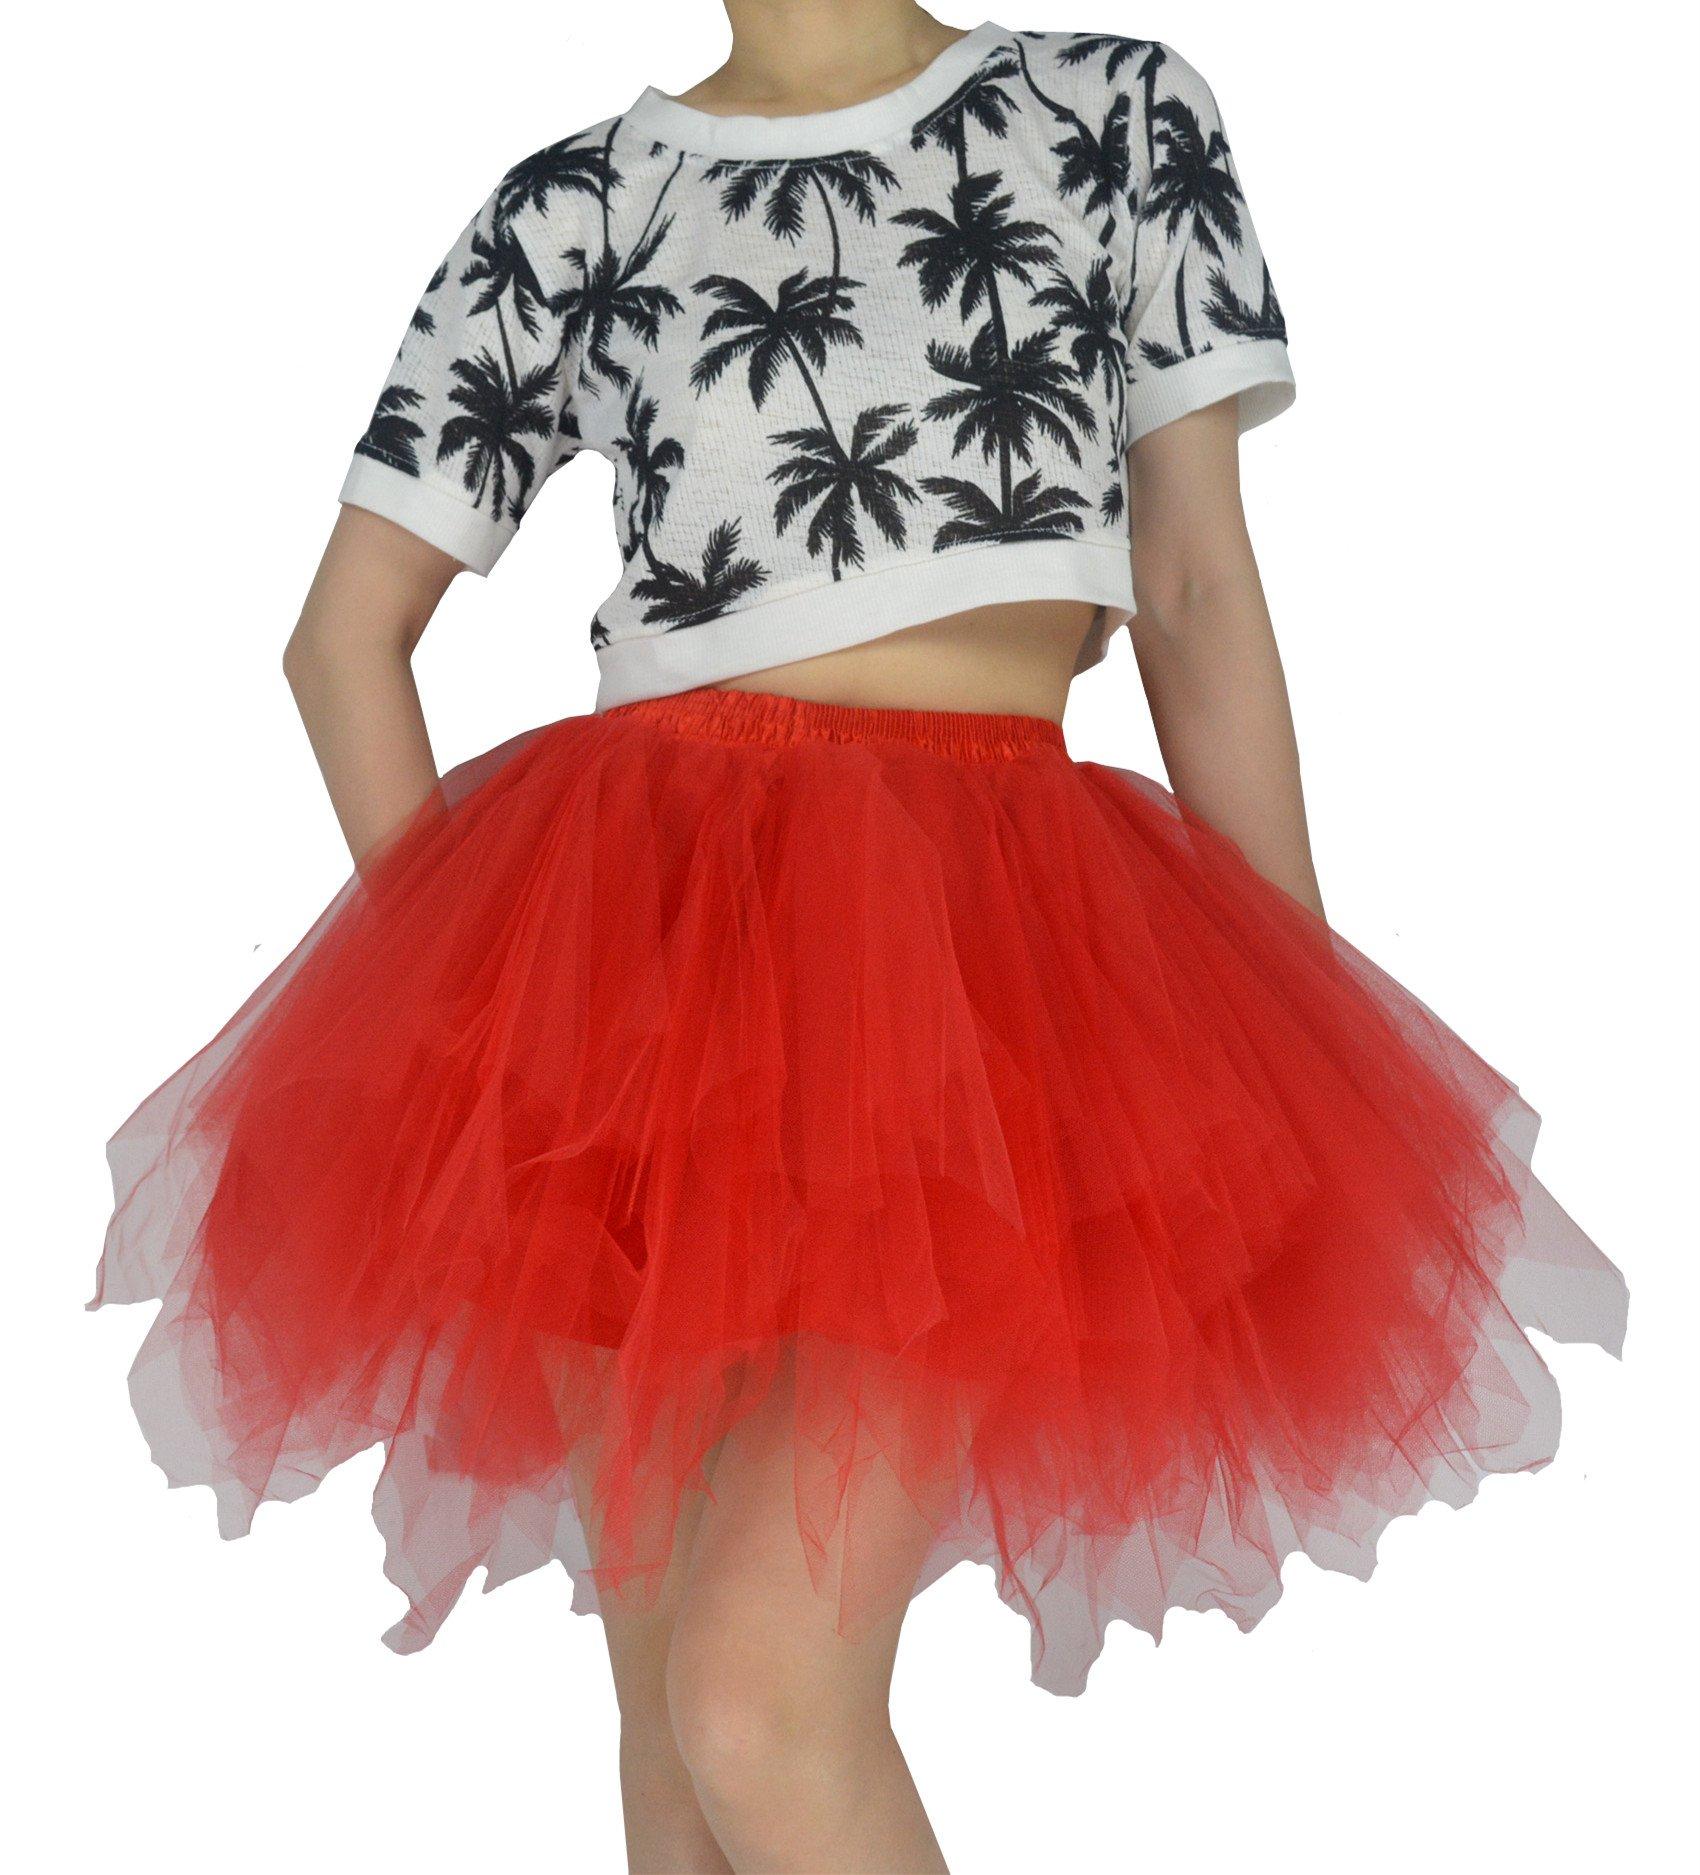 YSJERA Women's Tutu Tulle Mini A-Line Petticoat Prom Party Cosplay Skirt Fun Skirts (XL, Red)